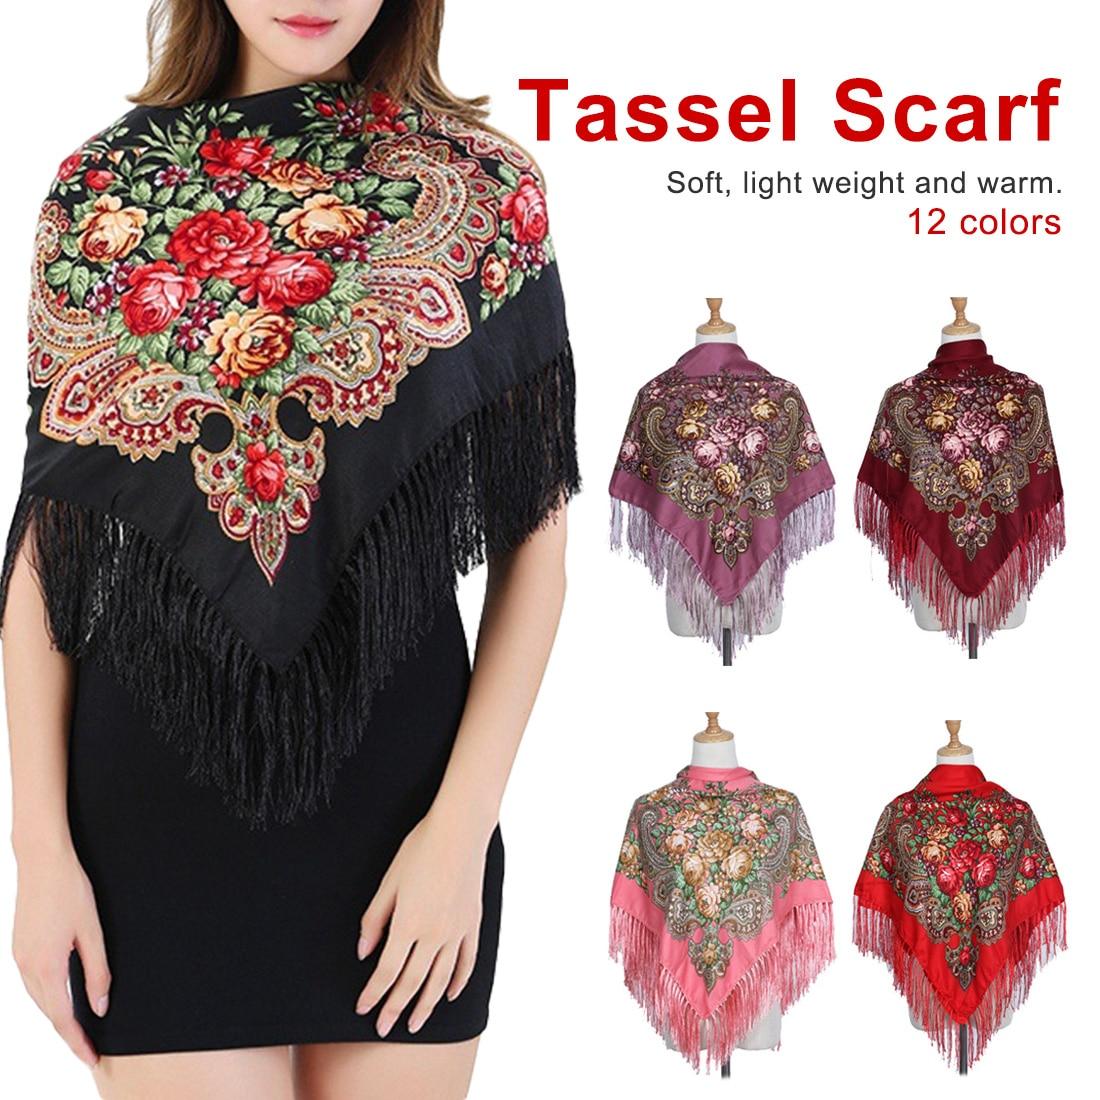 2019 New Brand Women Scarf Square Cotton Shawls And Wraps Lady Pashmina Tassels Bohemia Foulard Winter Female Bandana